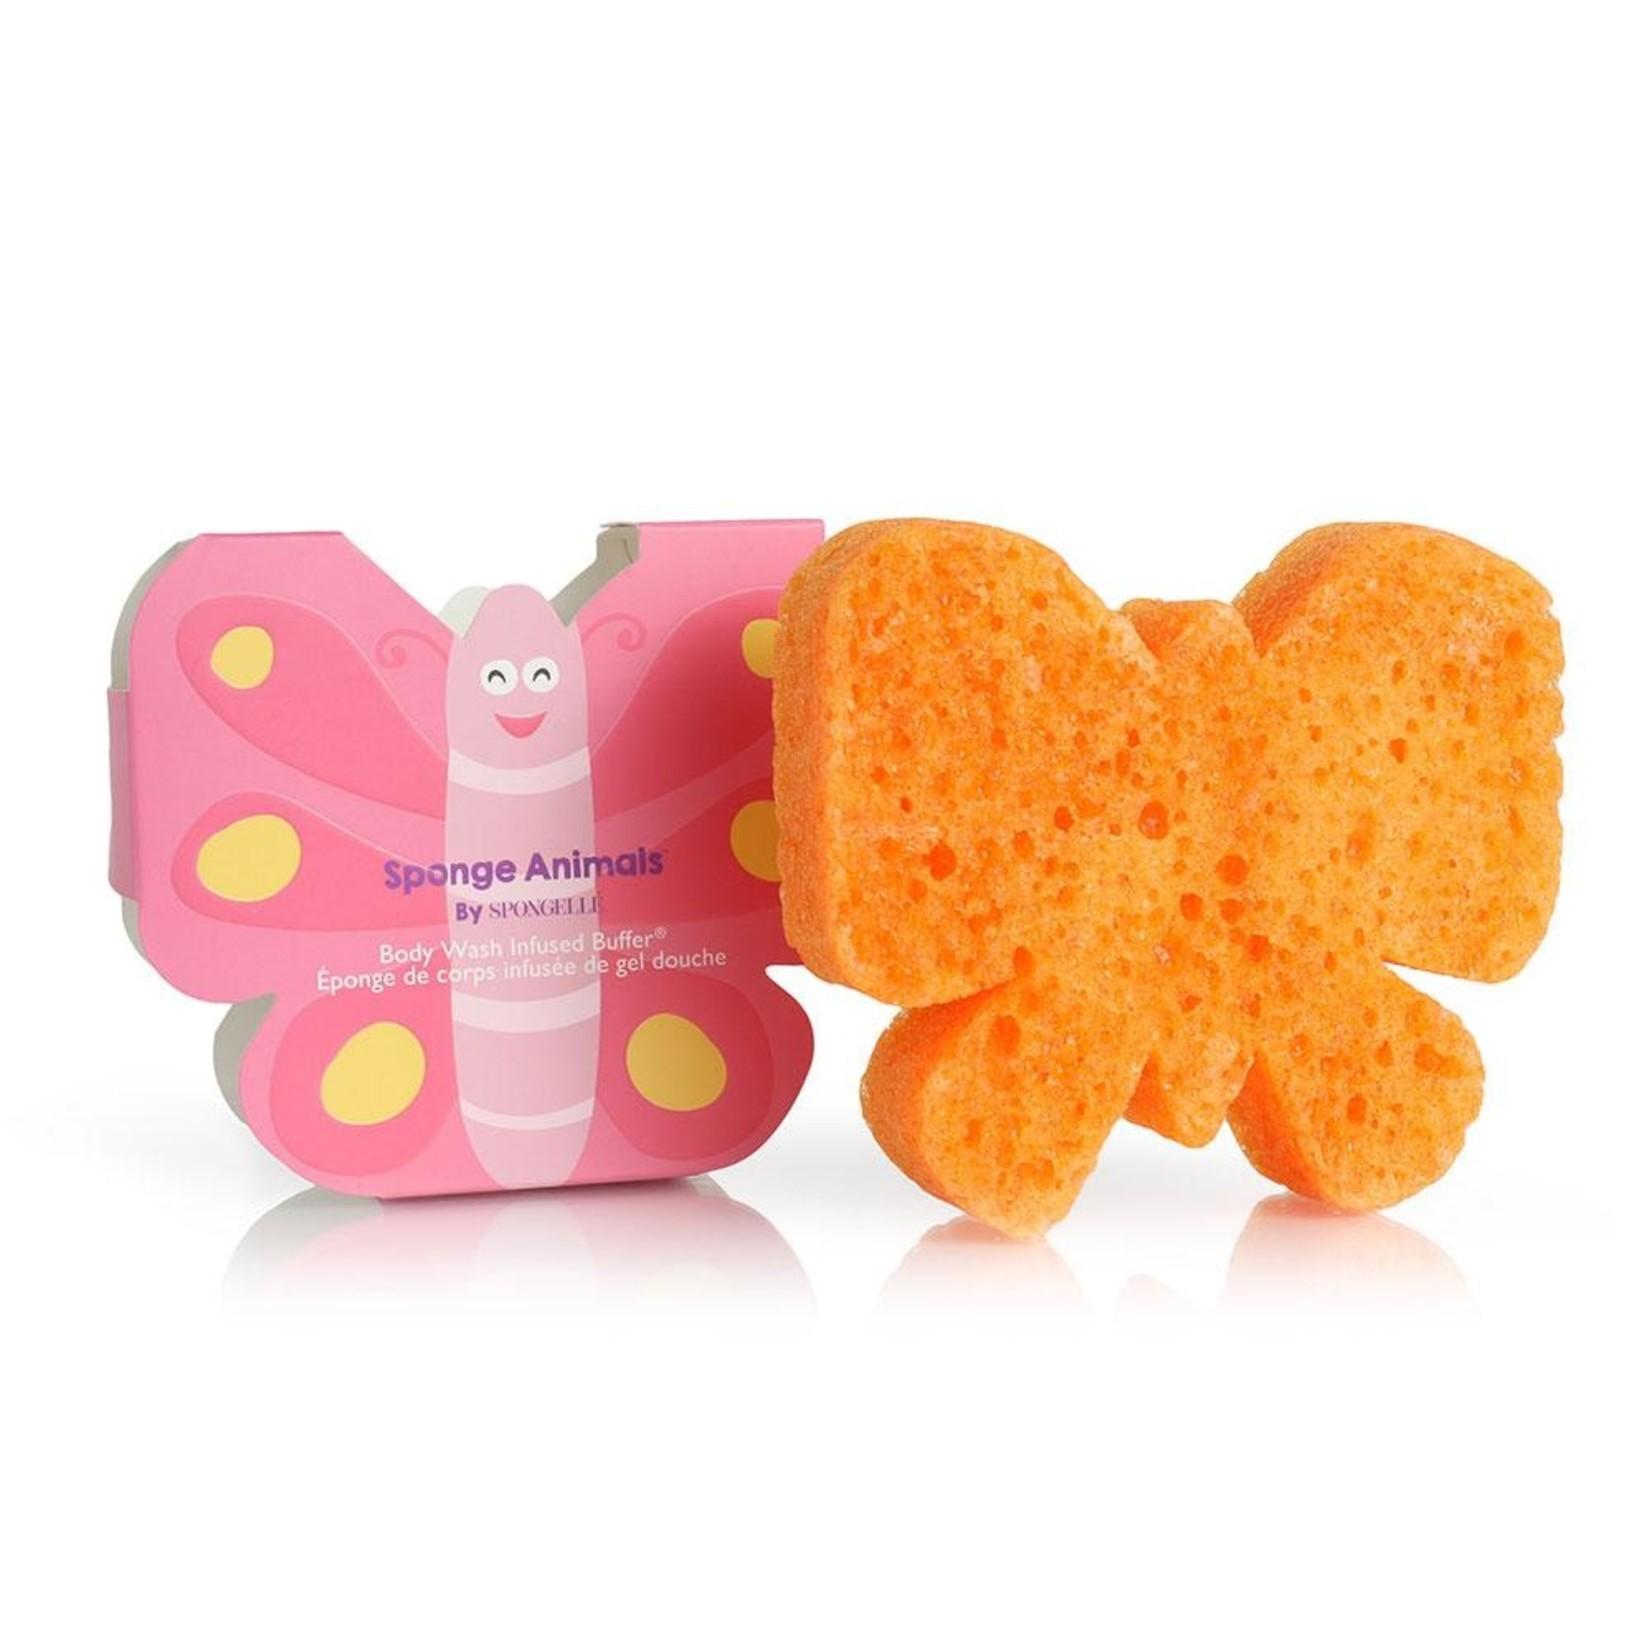 Spongelle Sponge Animals